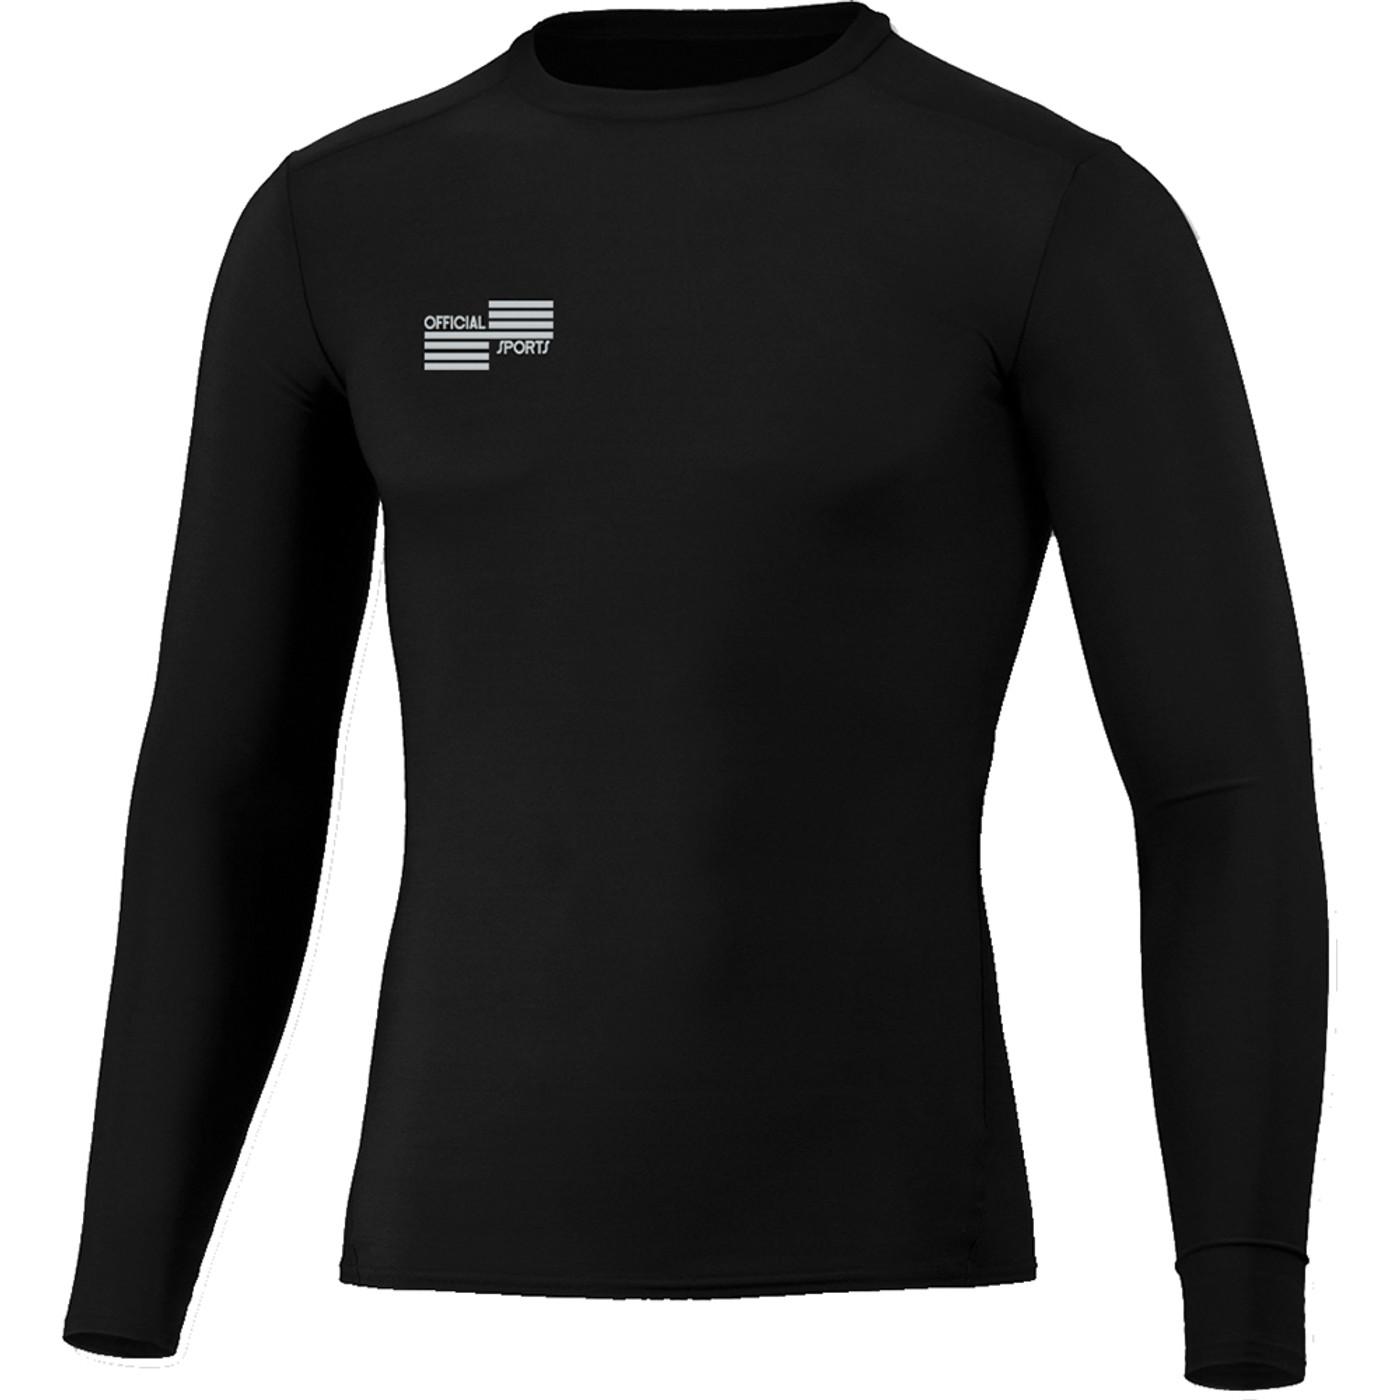 2237LSB Long Sleeve Compression T-Shirt